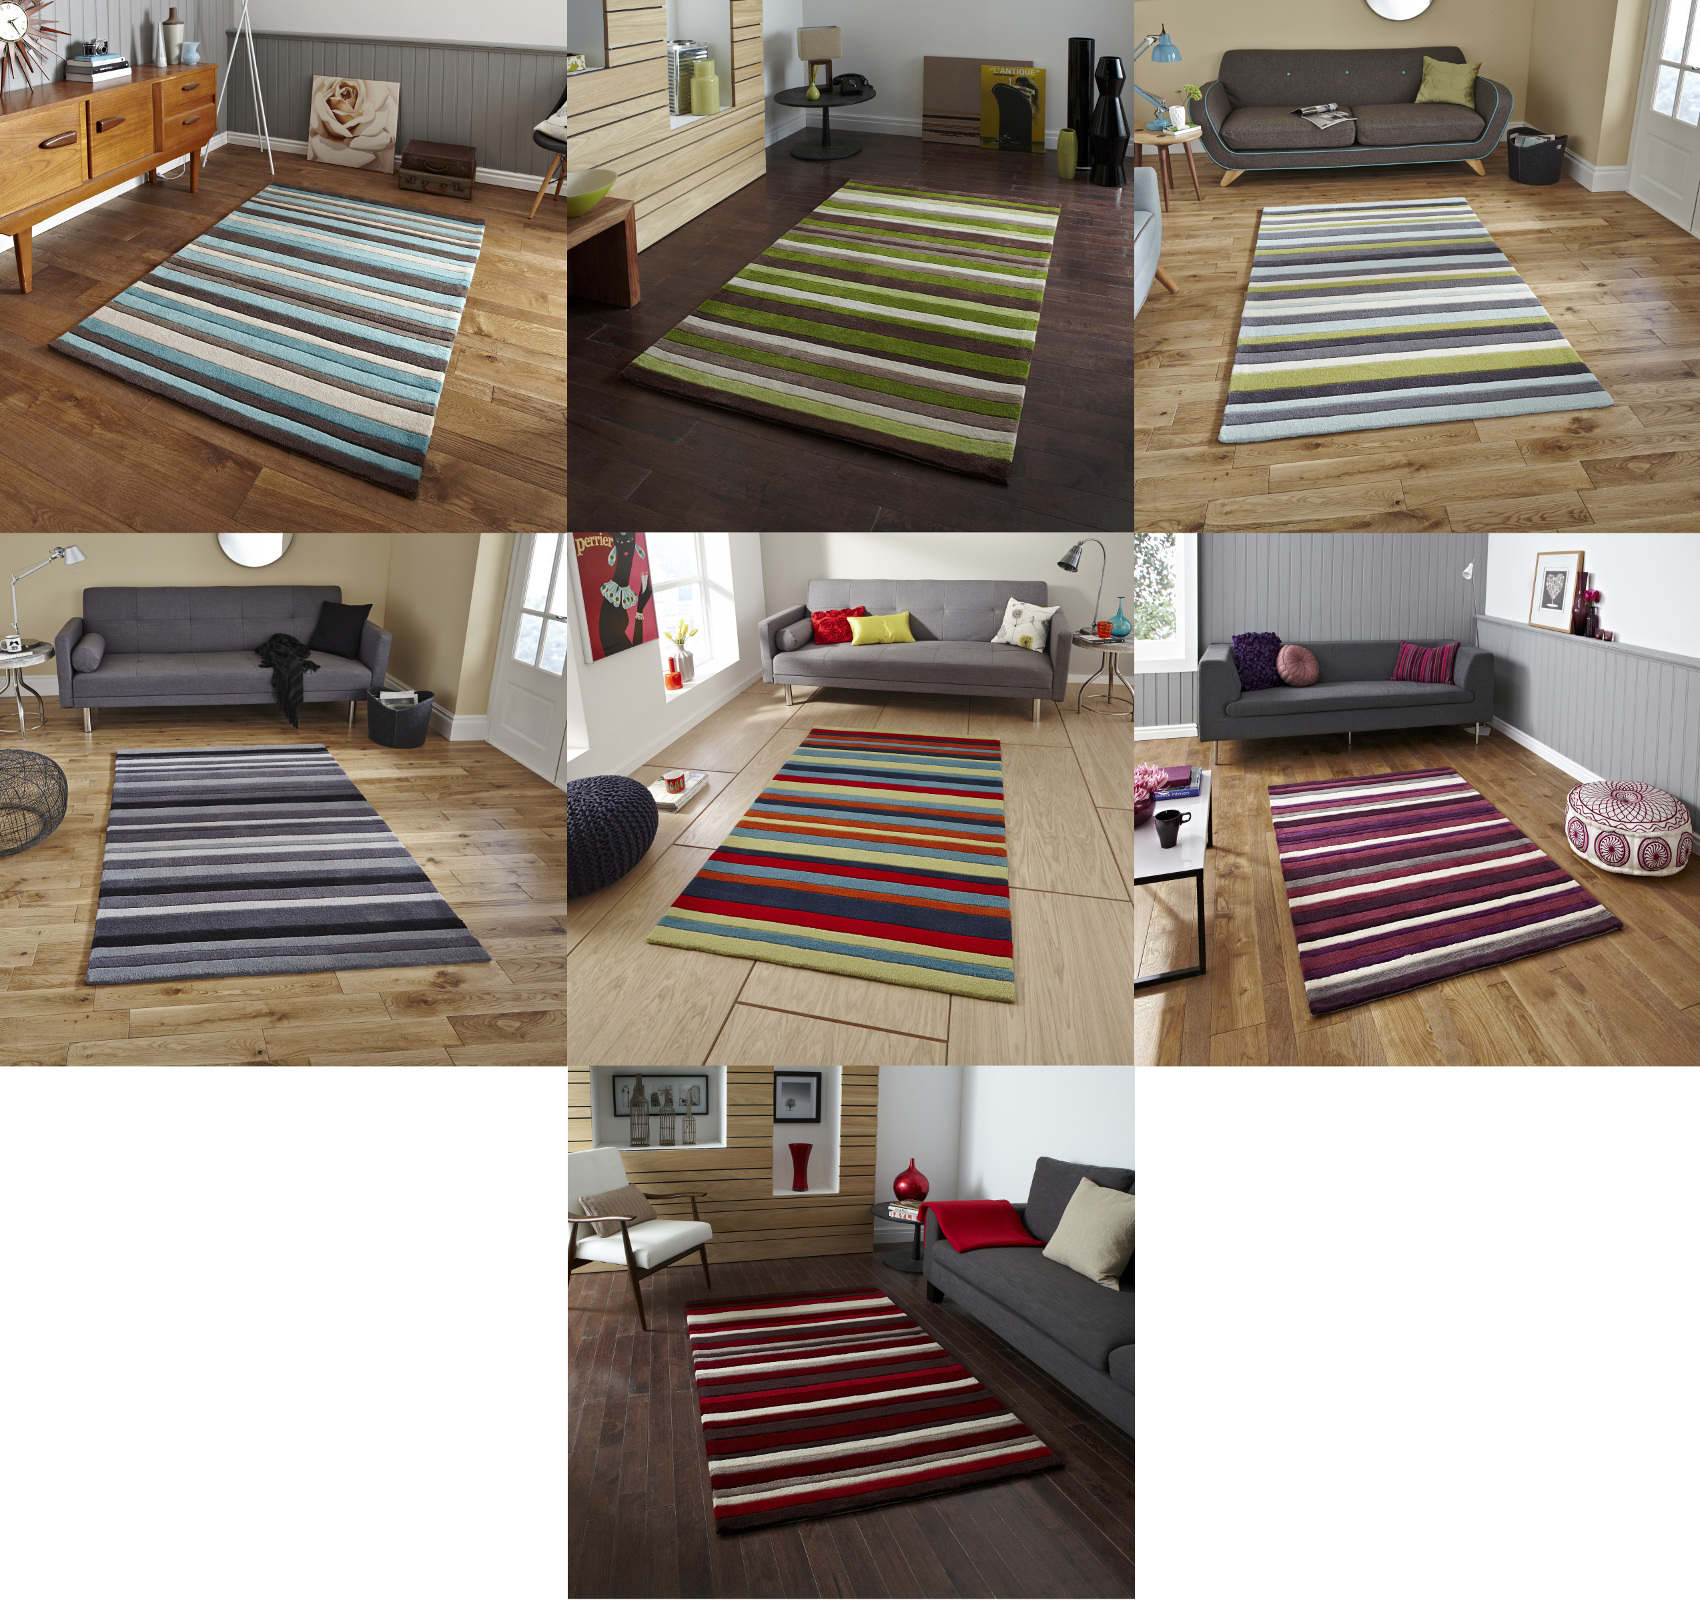 Hong Kong Hand Tufted Large Modern Rug Striped Design Acrylic Home Decor Mat